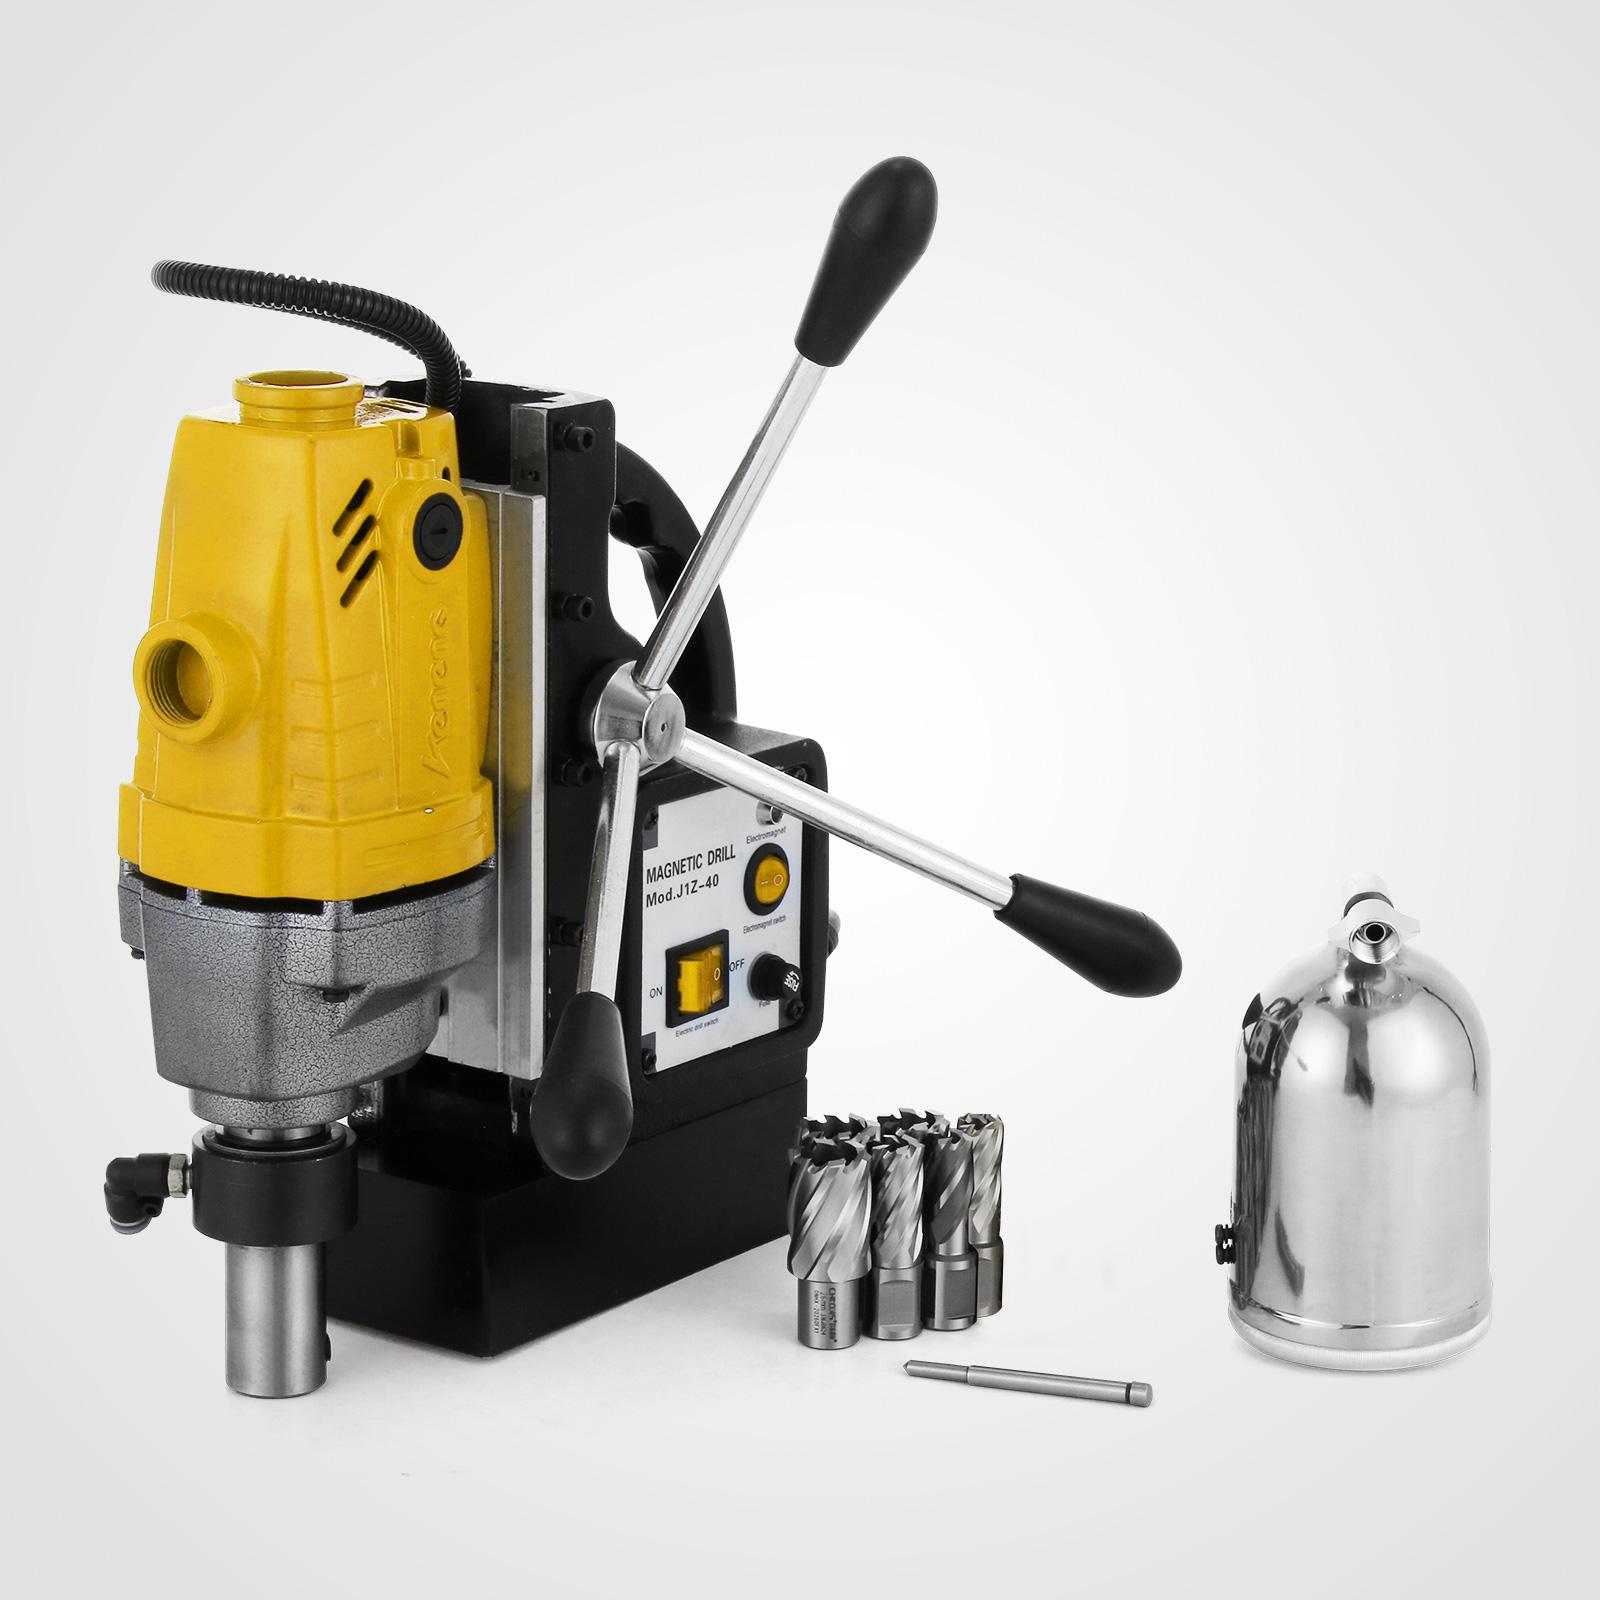 MB23-BRM35-MD40-Trapano-Perforatrice-Carotatore-Fresa-Magnetico-12-40mm-230V miniatura 27